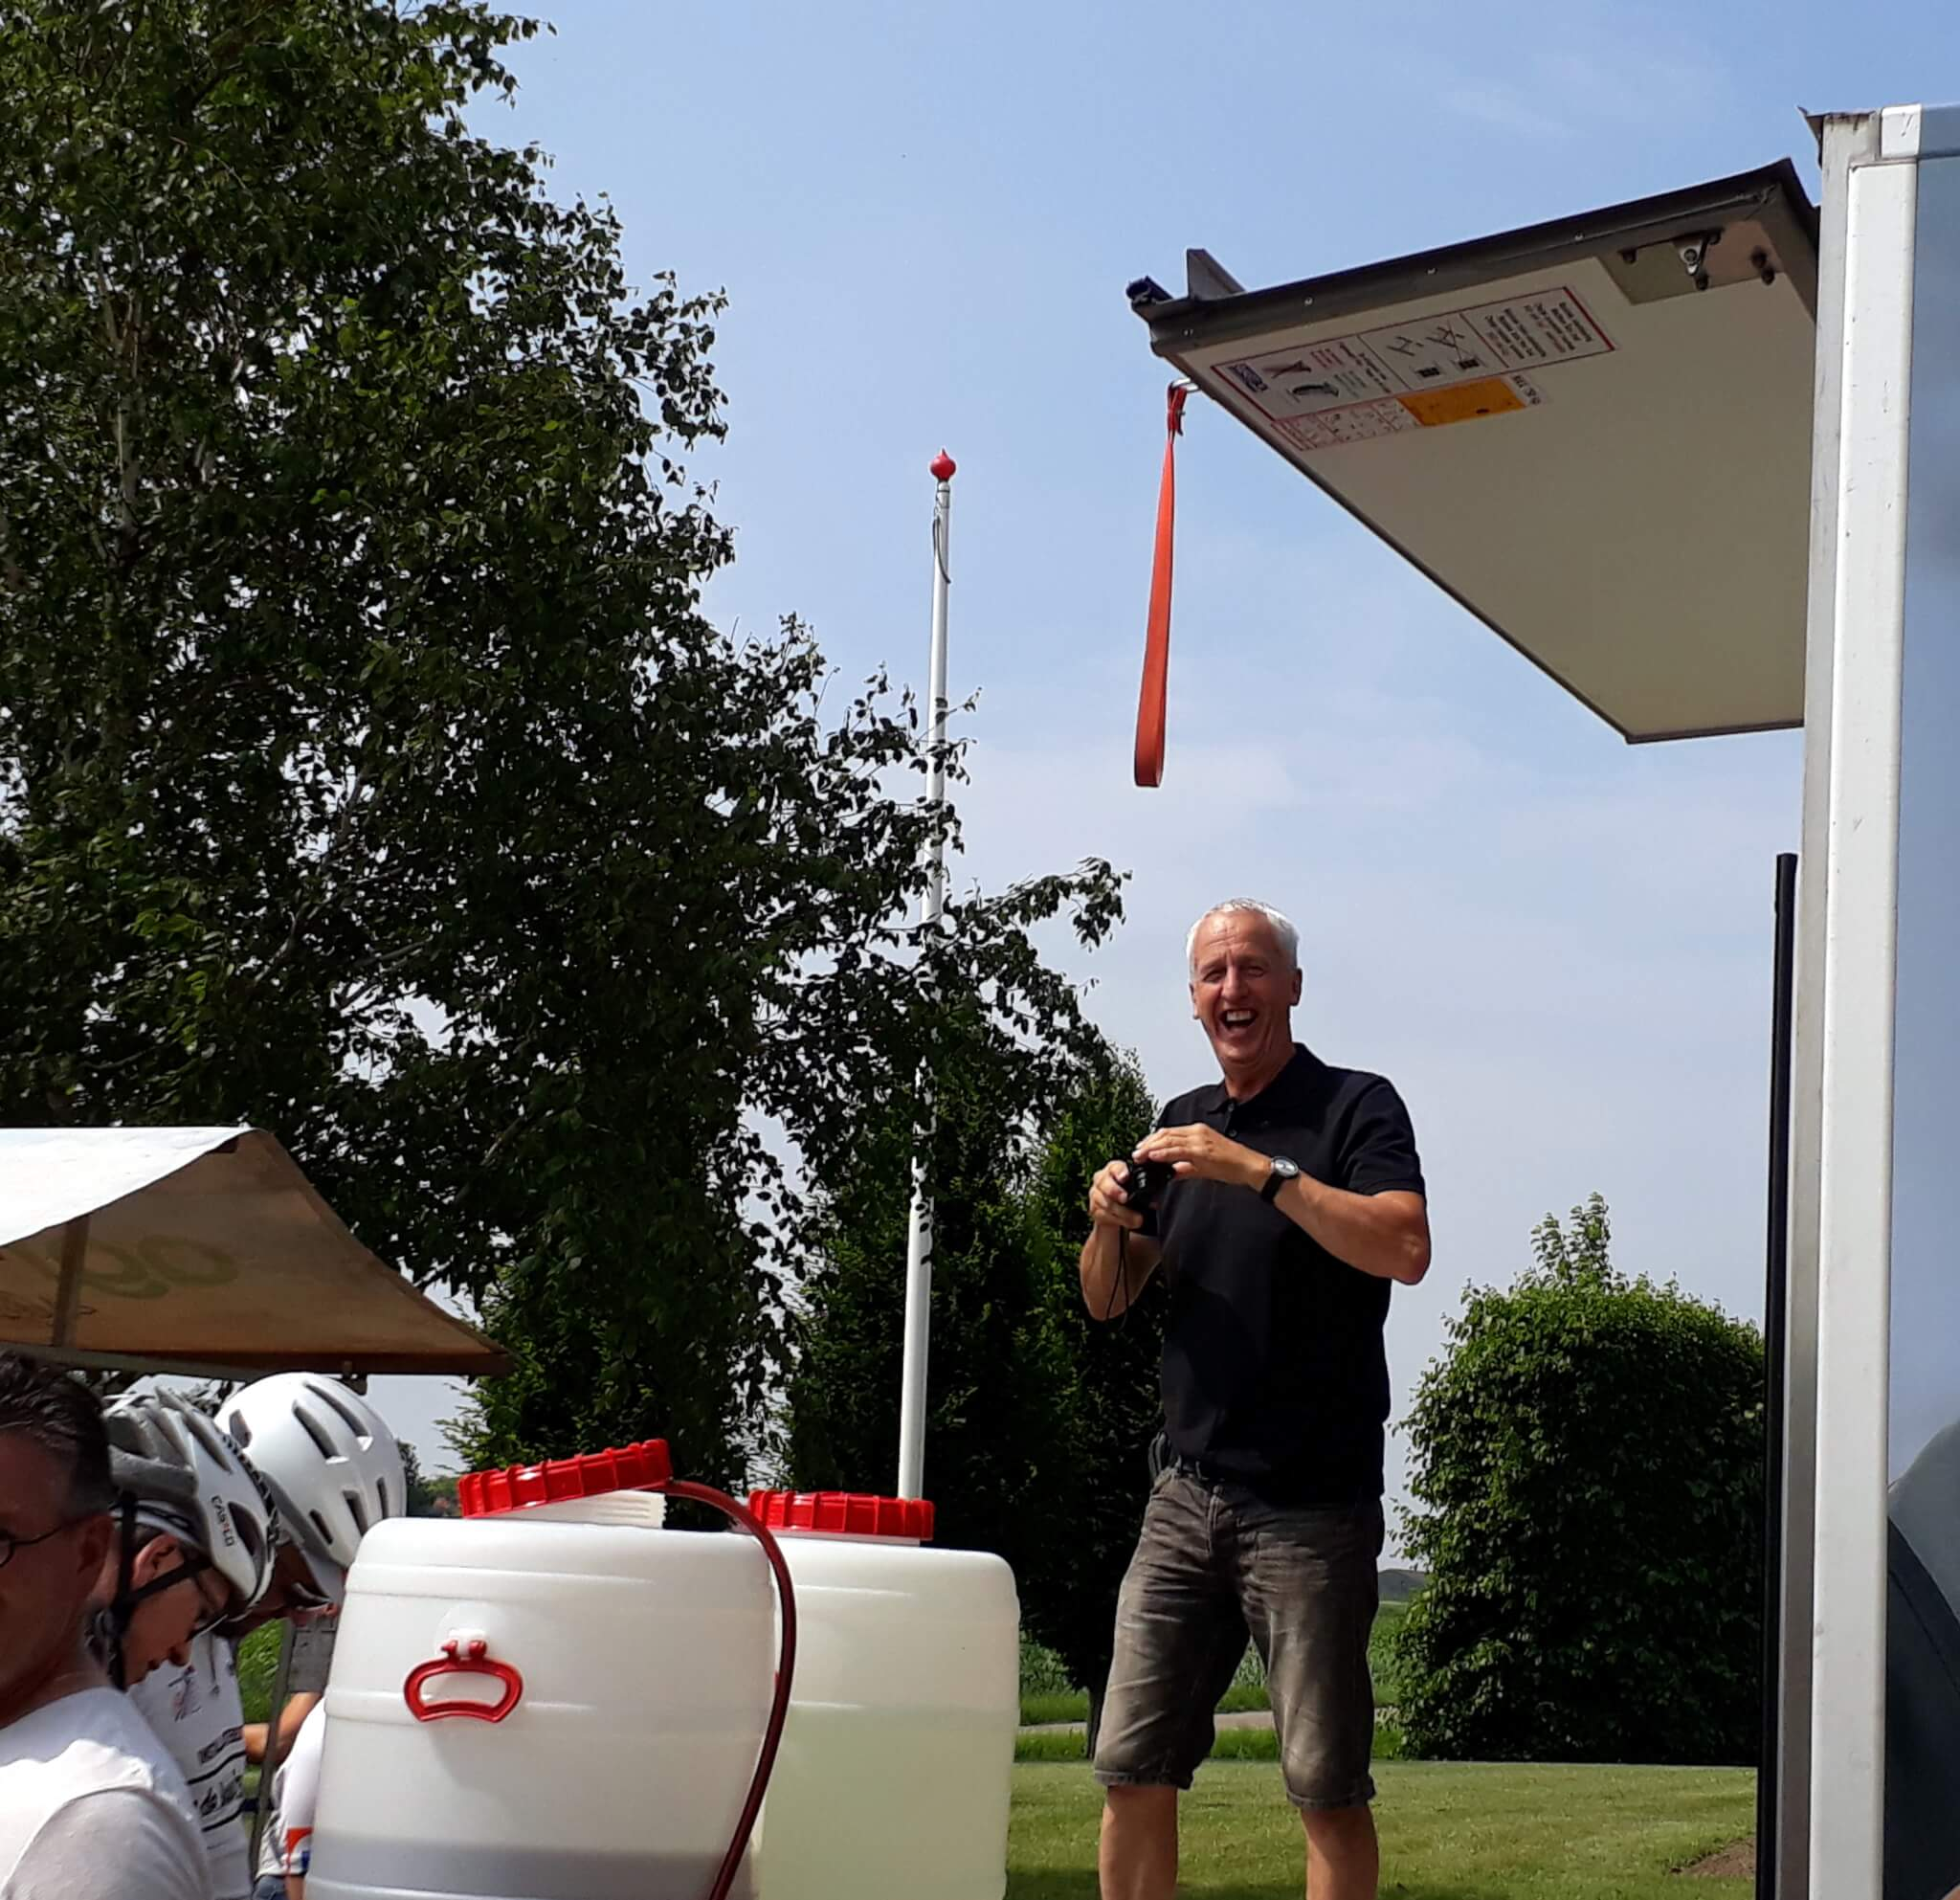 Fruitbedrijf Van den Berge_Ride for the Roses-12